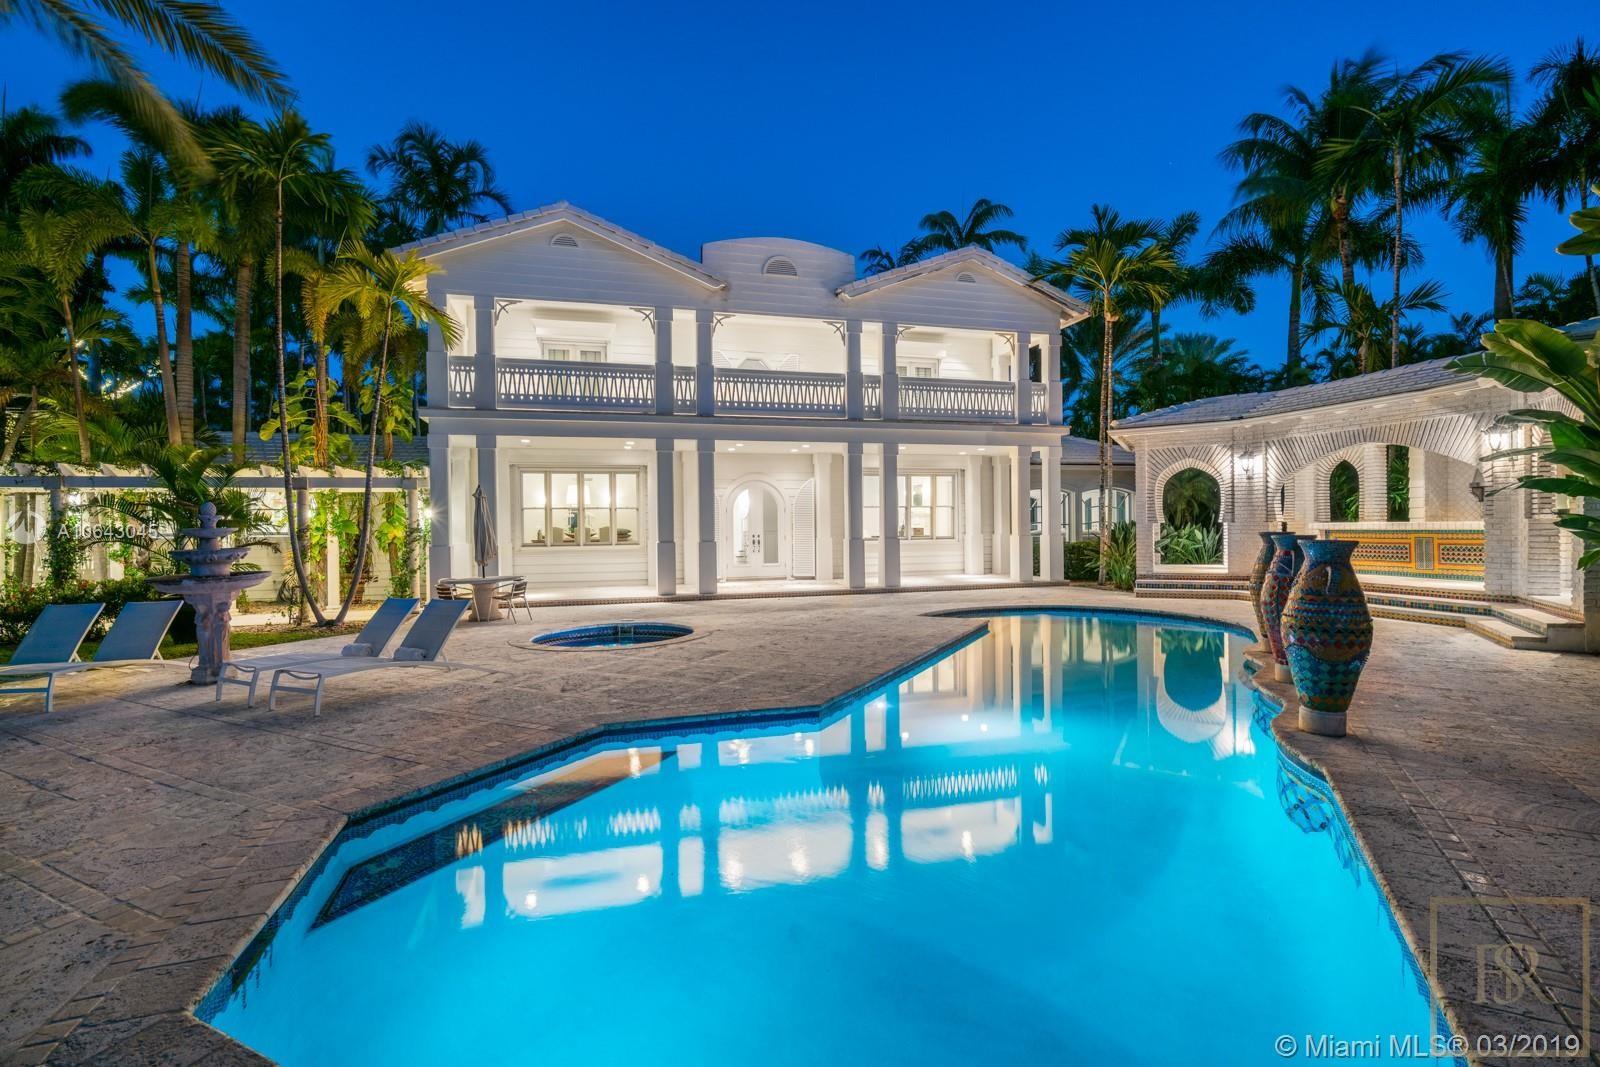 House STAR ISLAND 1 Star Island Dr - Miami Beach, USA for sale For Super Rich